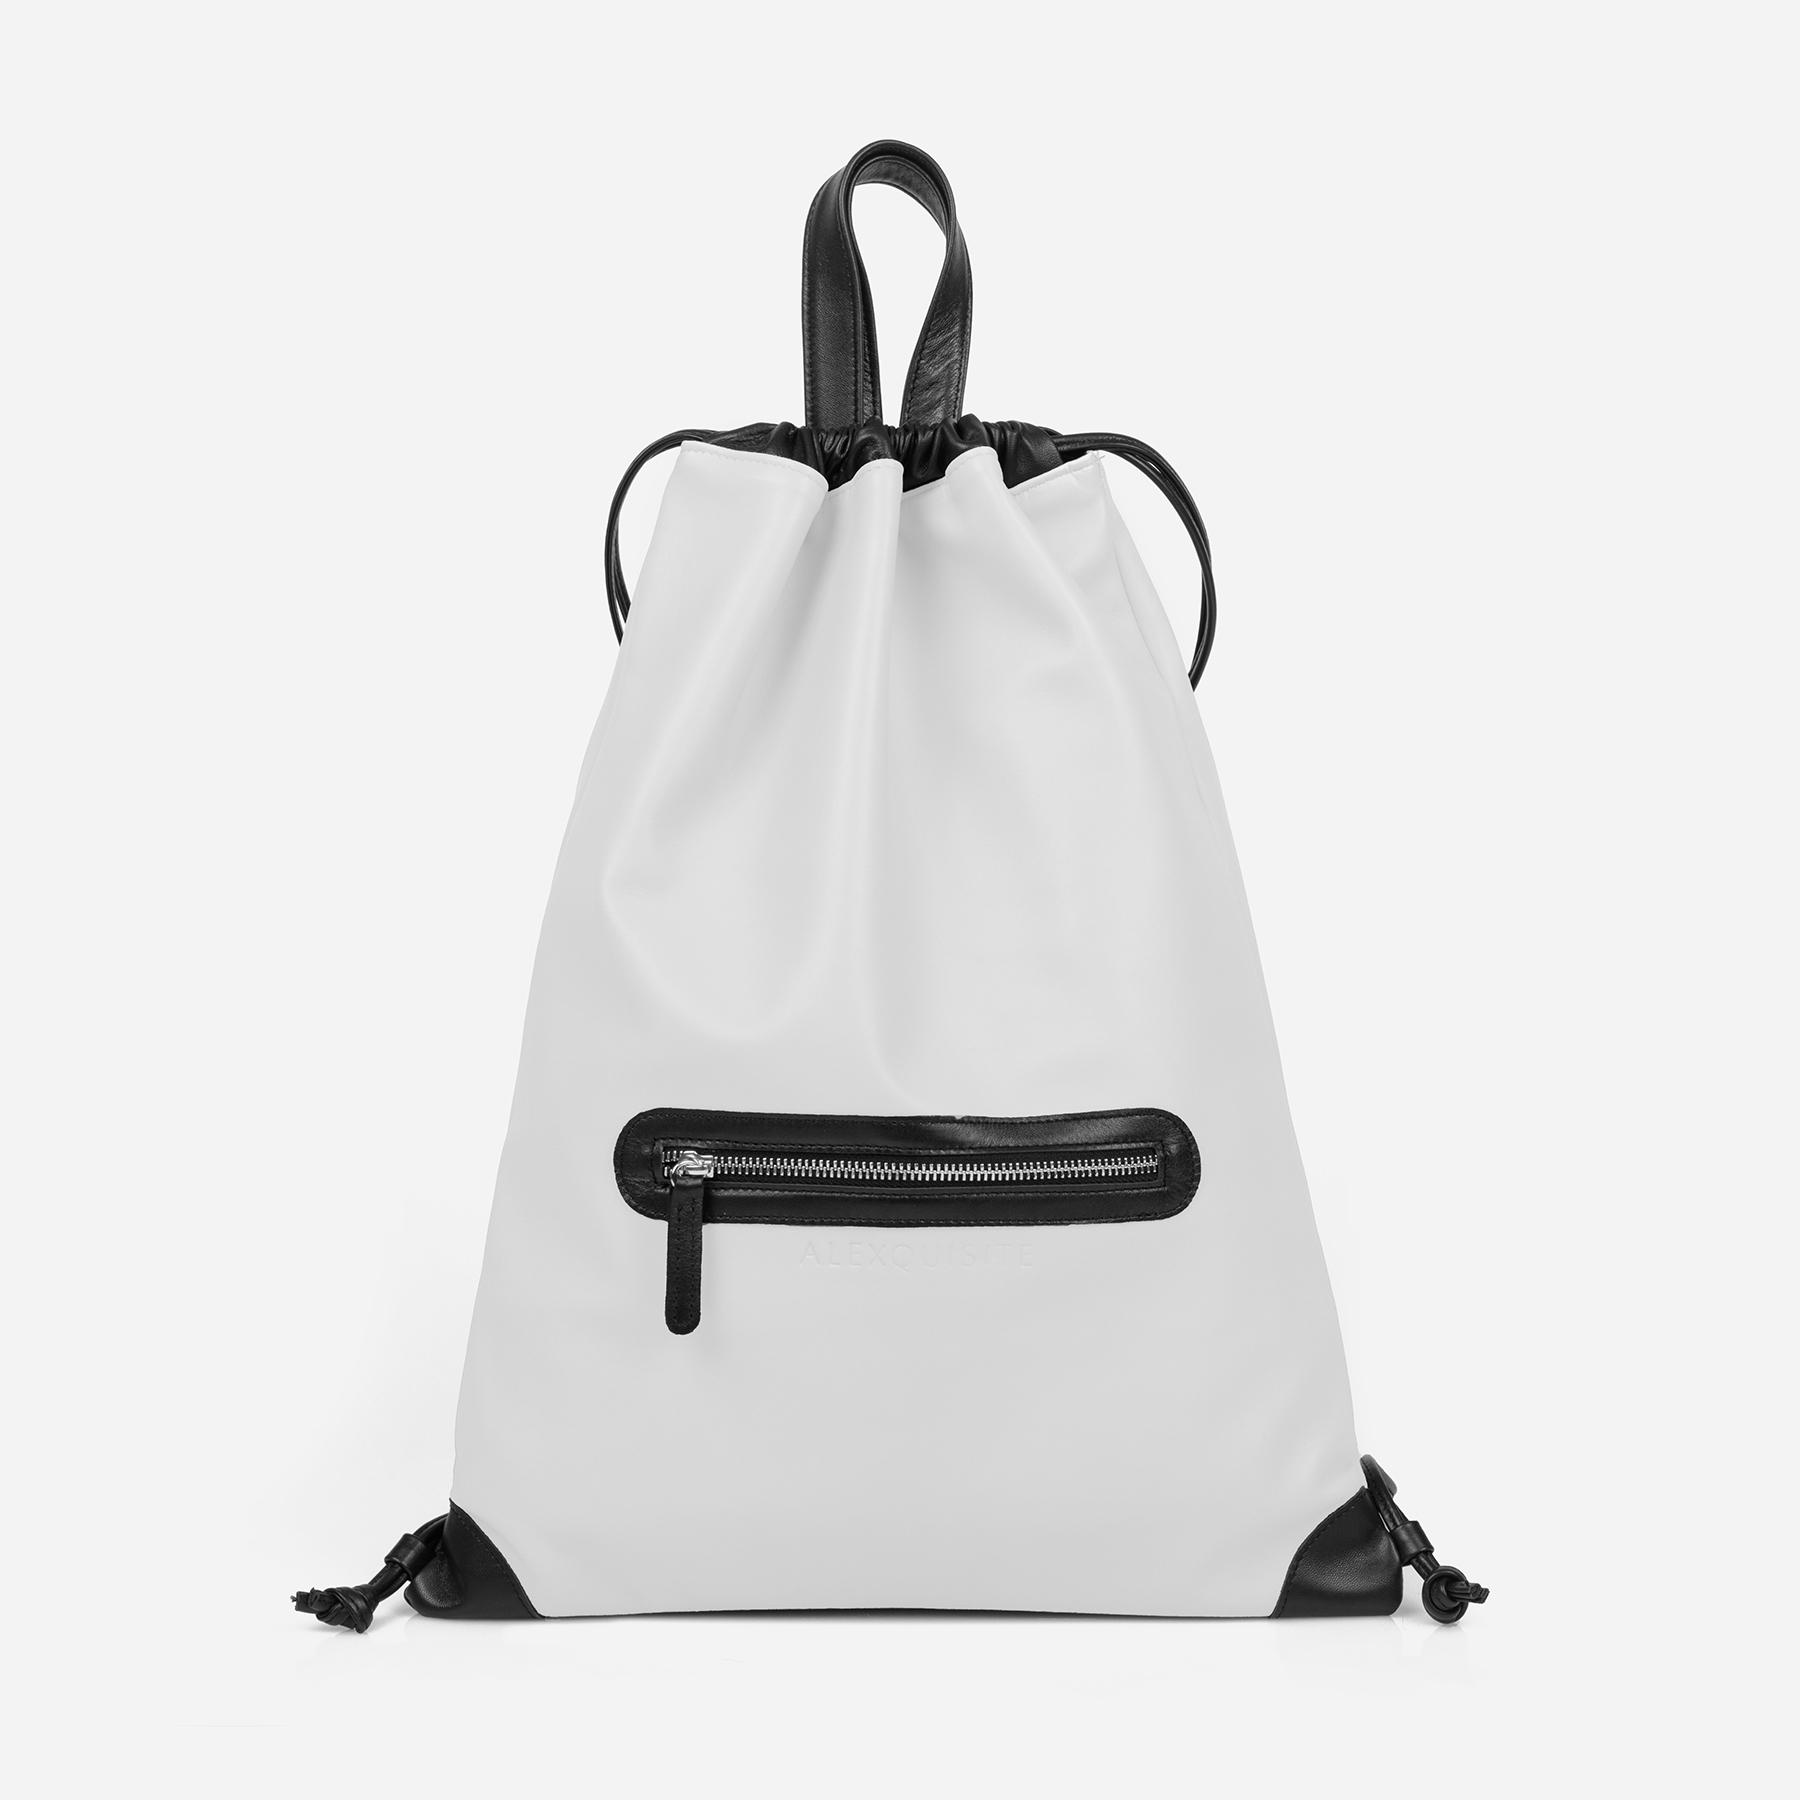 04973193c1ad9 ALEXQUISITE Essential Drawstring Backpack White